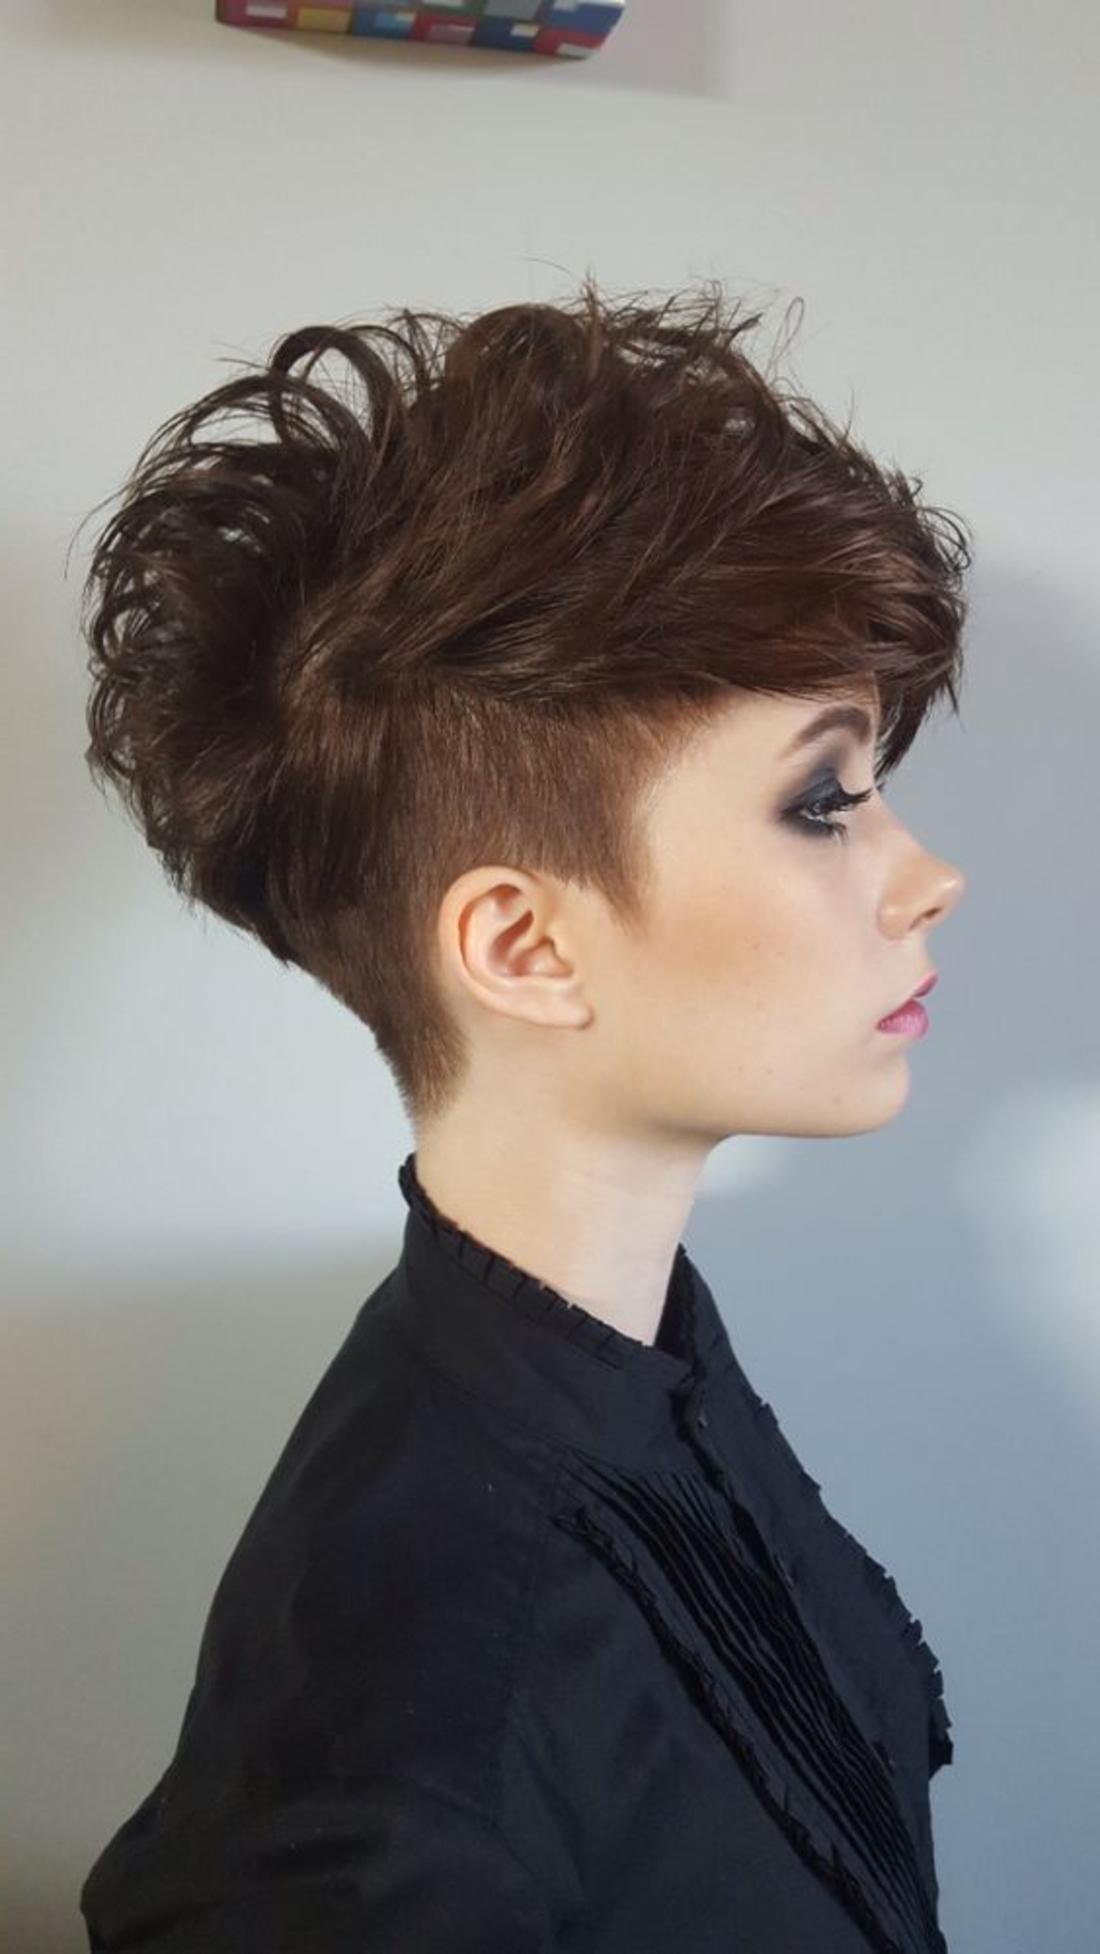 Undercut Frisuren Hinterkopf braune Haare wie Dreieck rasiert lila Lippenstift schwarze Bluse